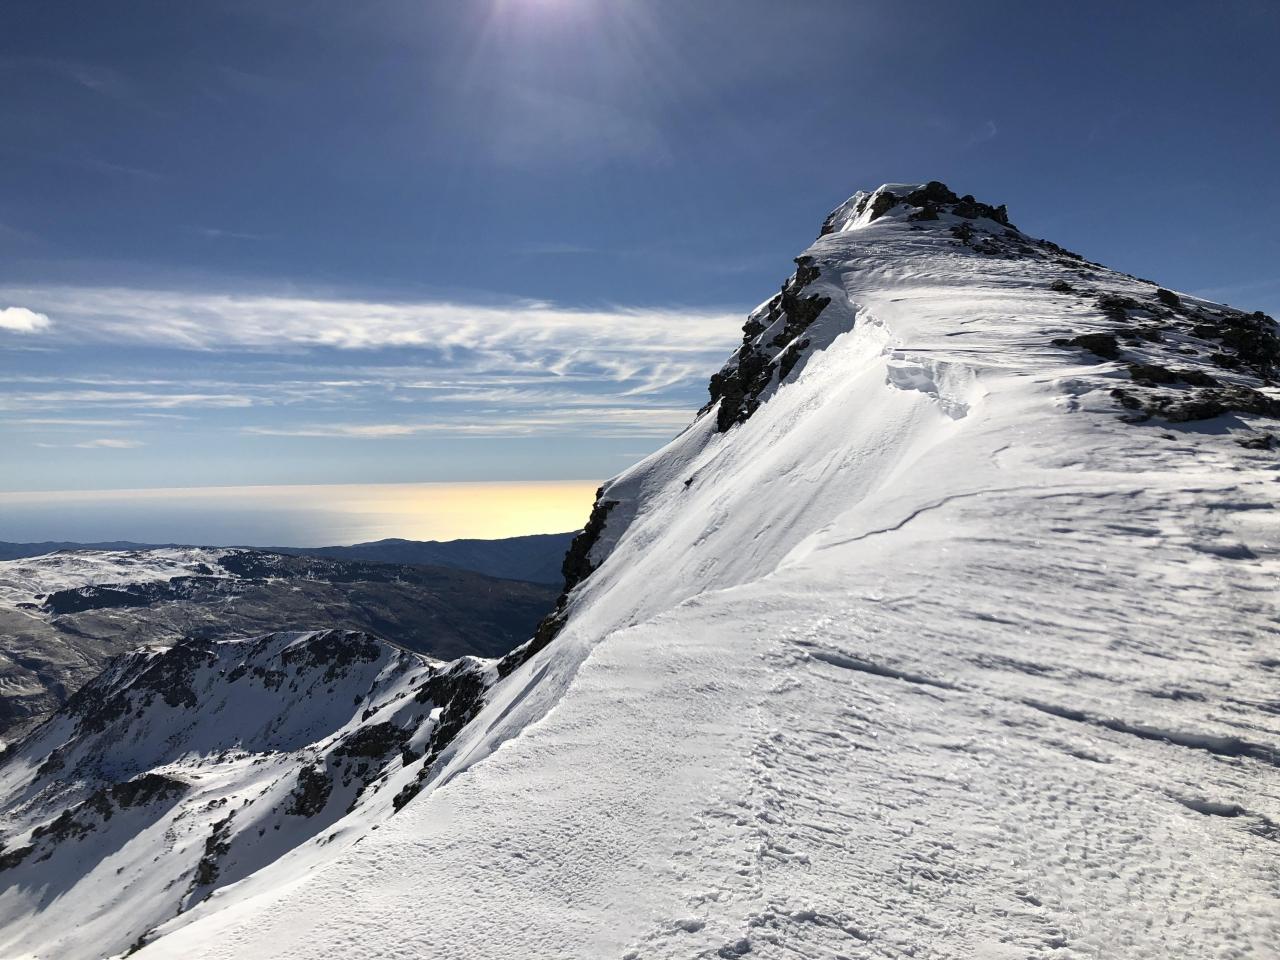 A picture from Sierra Nevada by Javi de Mora